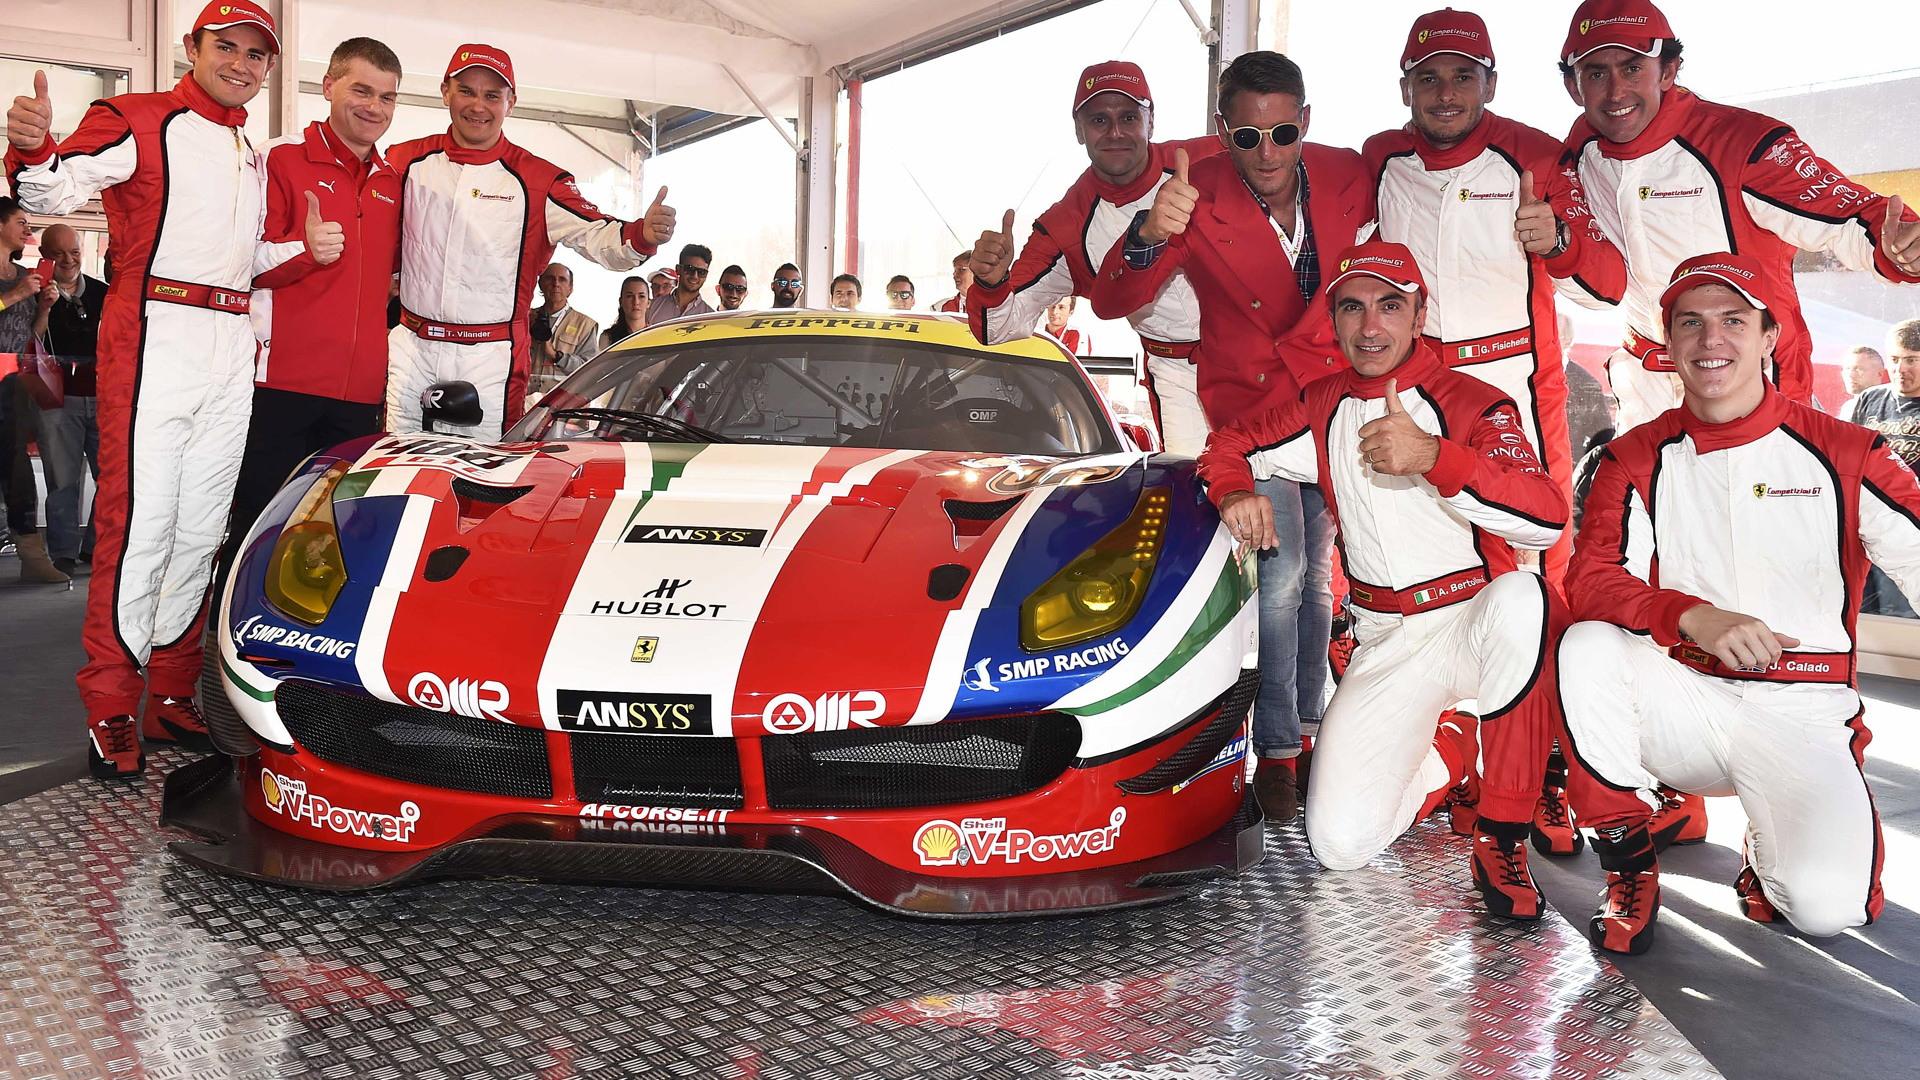 2016 Ferrari 488 GTE, 2015 Finali Mondiali